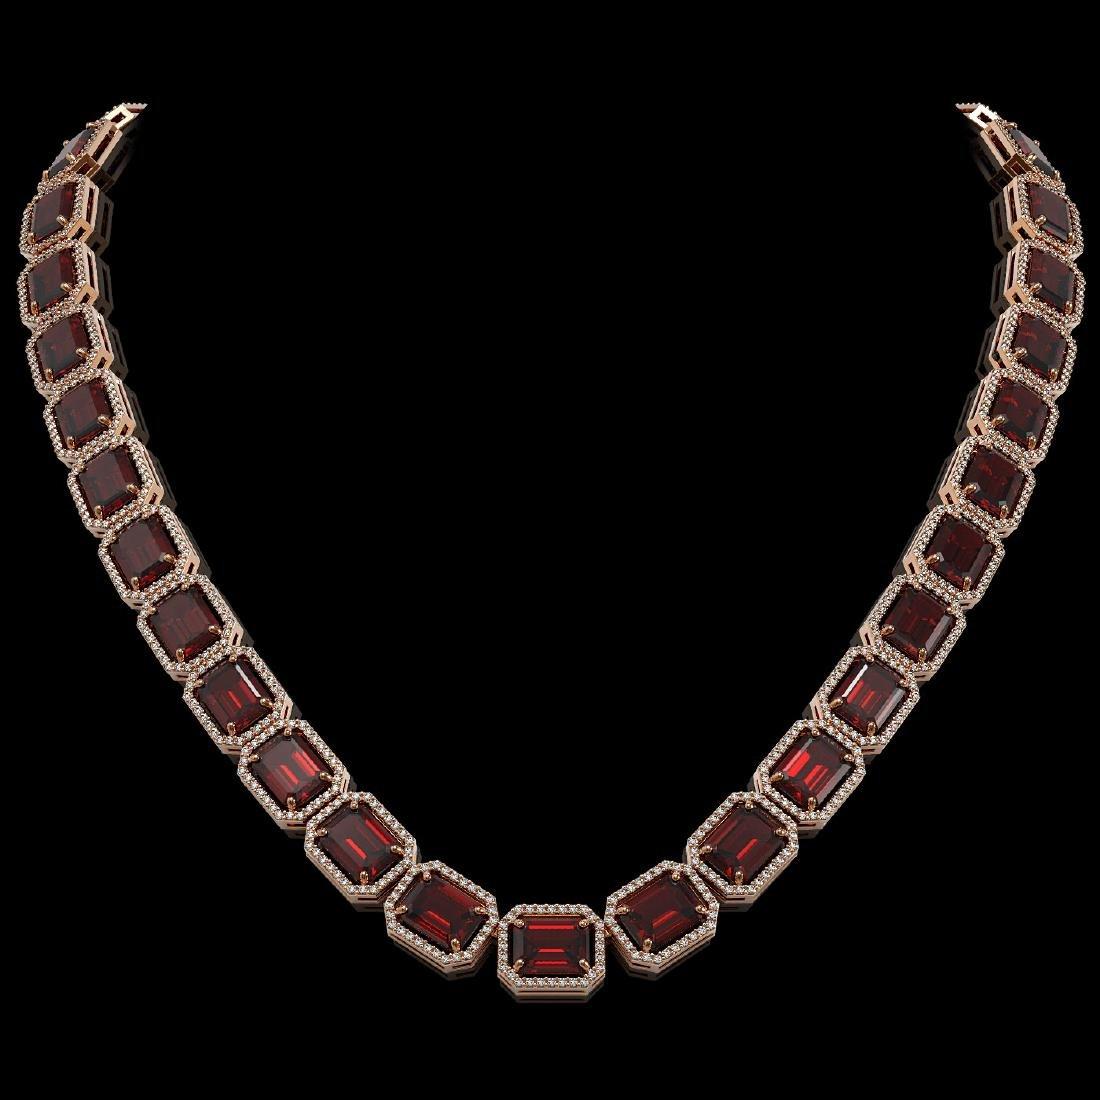 73.44 CTW Garnet & Diamond Halo Necklace 10K Rose Gold